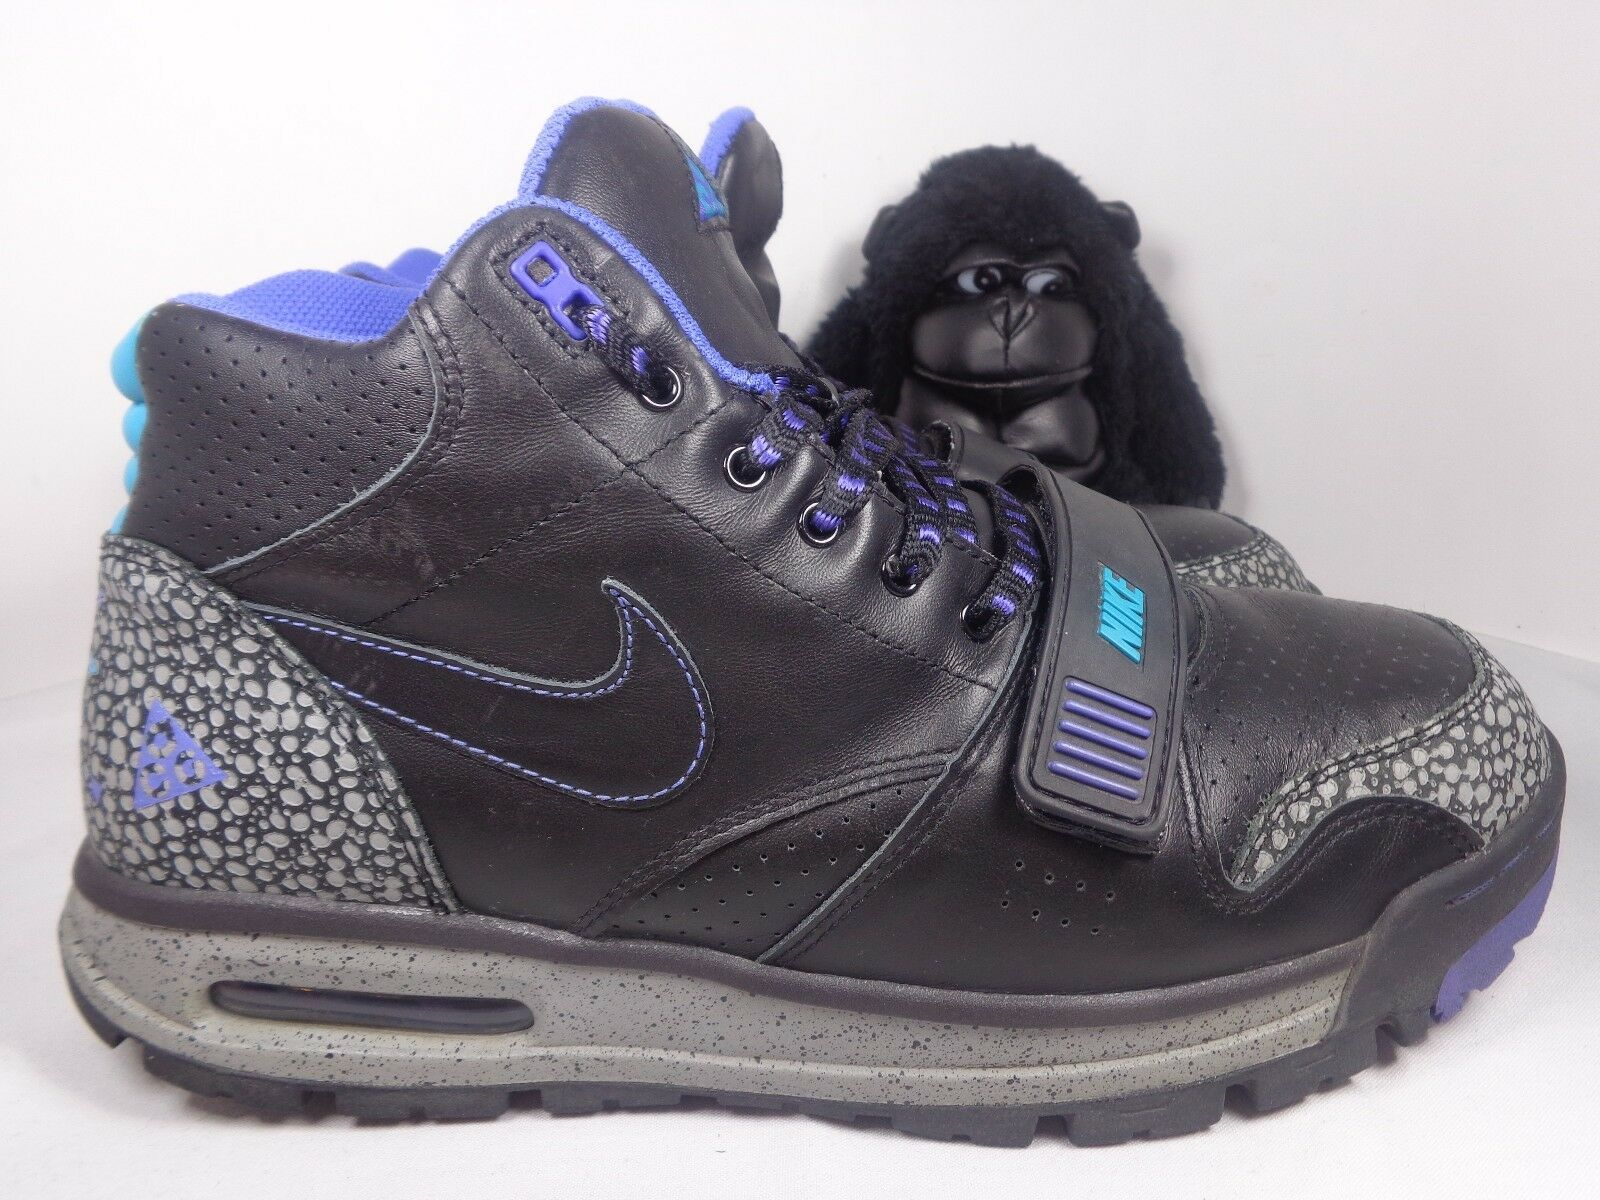 Mens Nike Air Max Chisulo ACG Basketball shoes size 11 US 375457-001